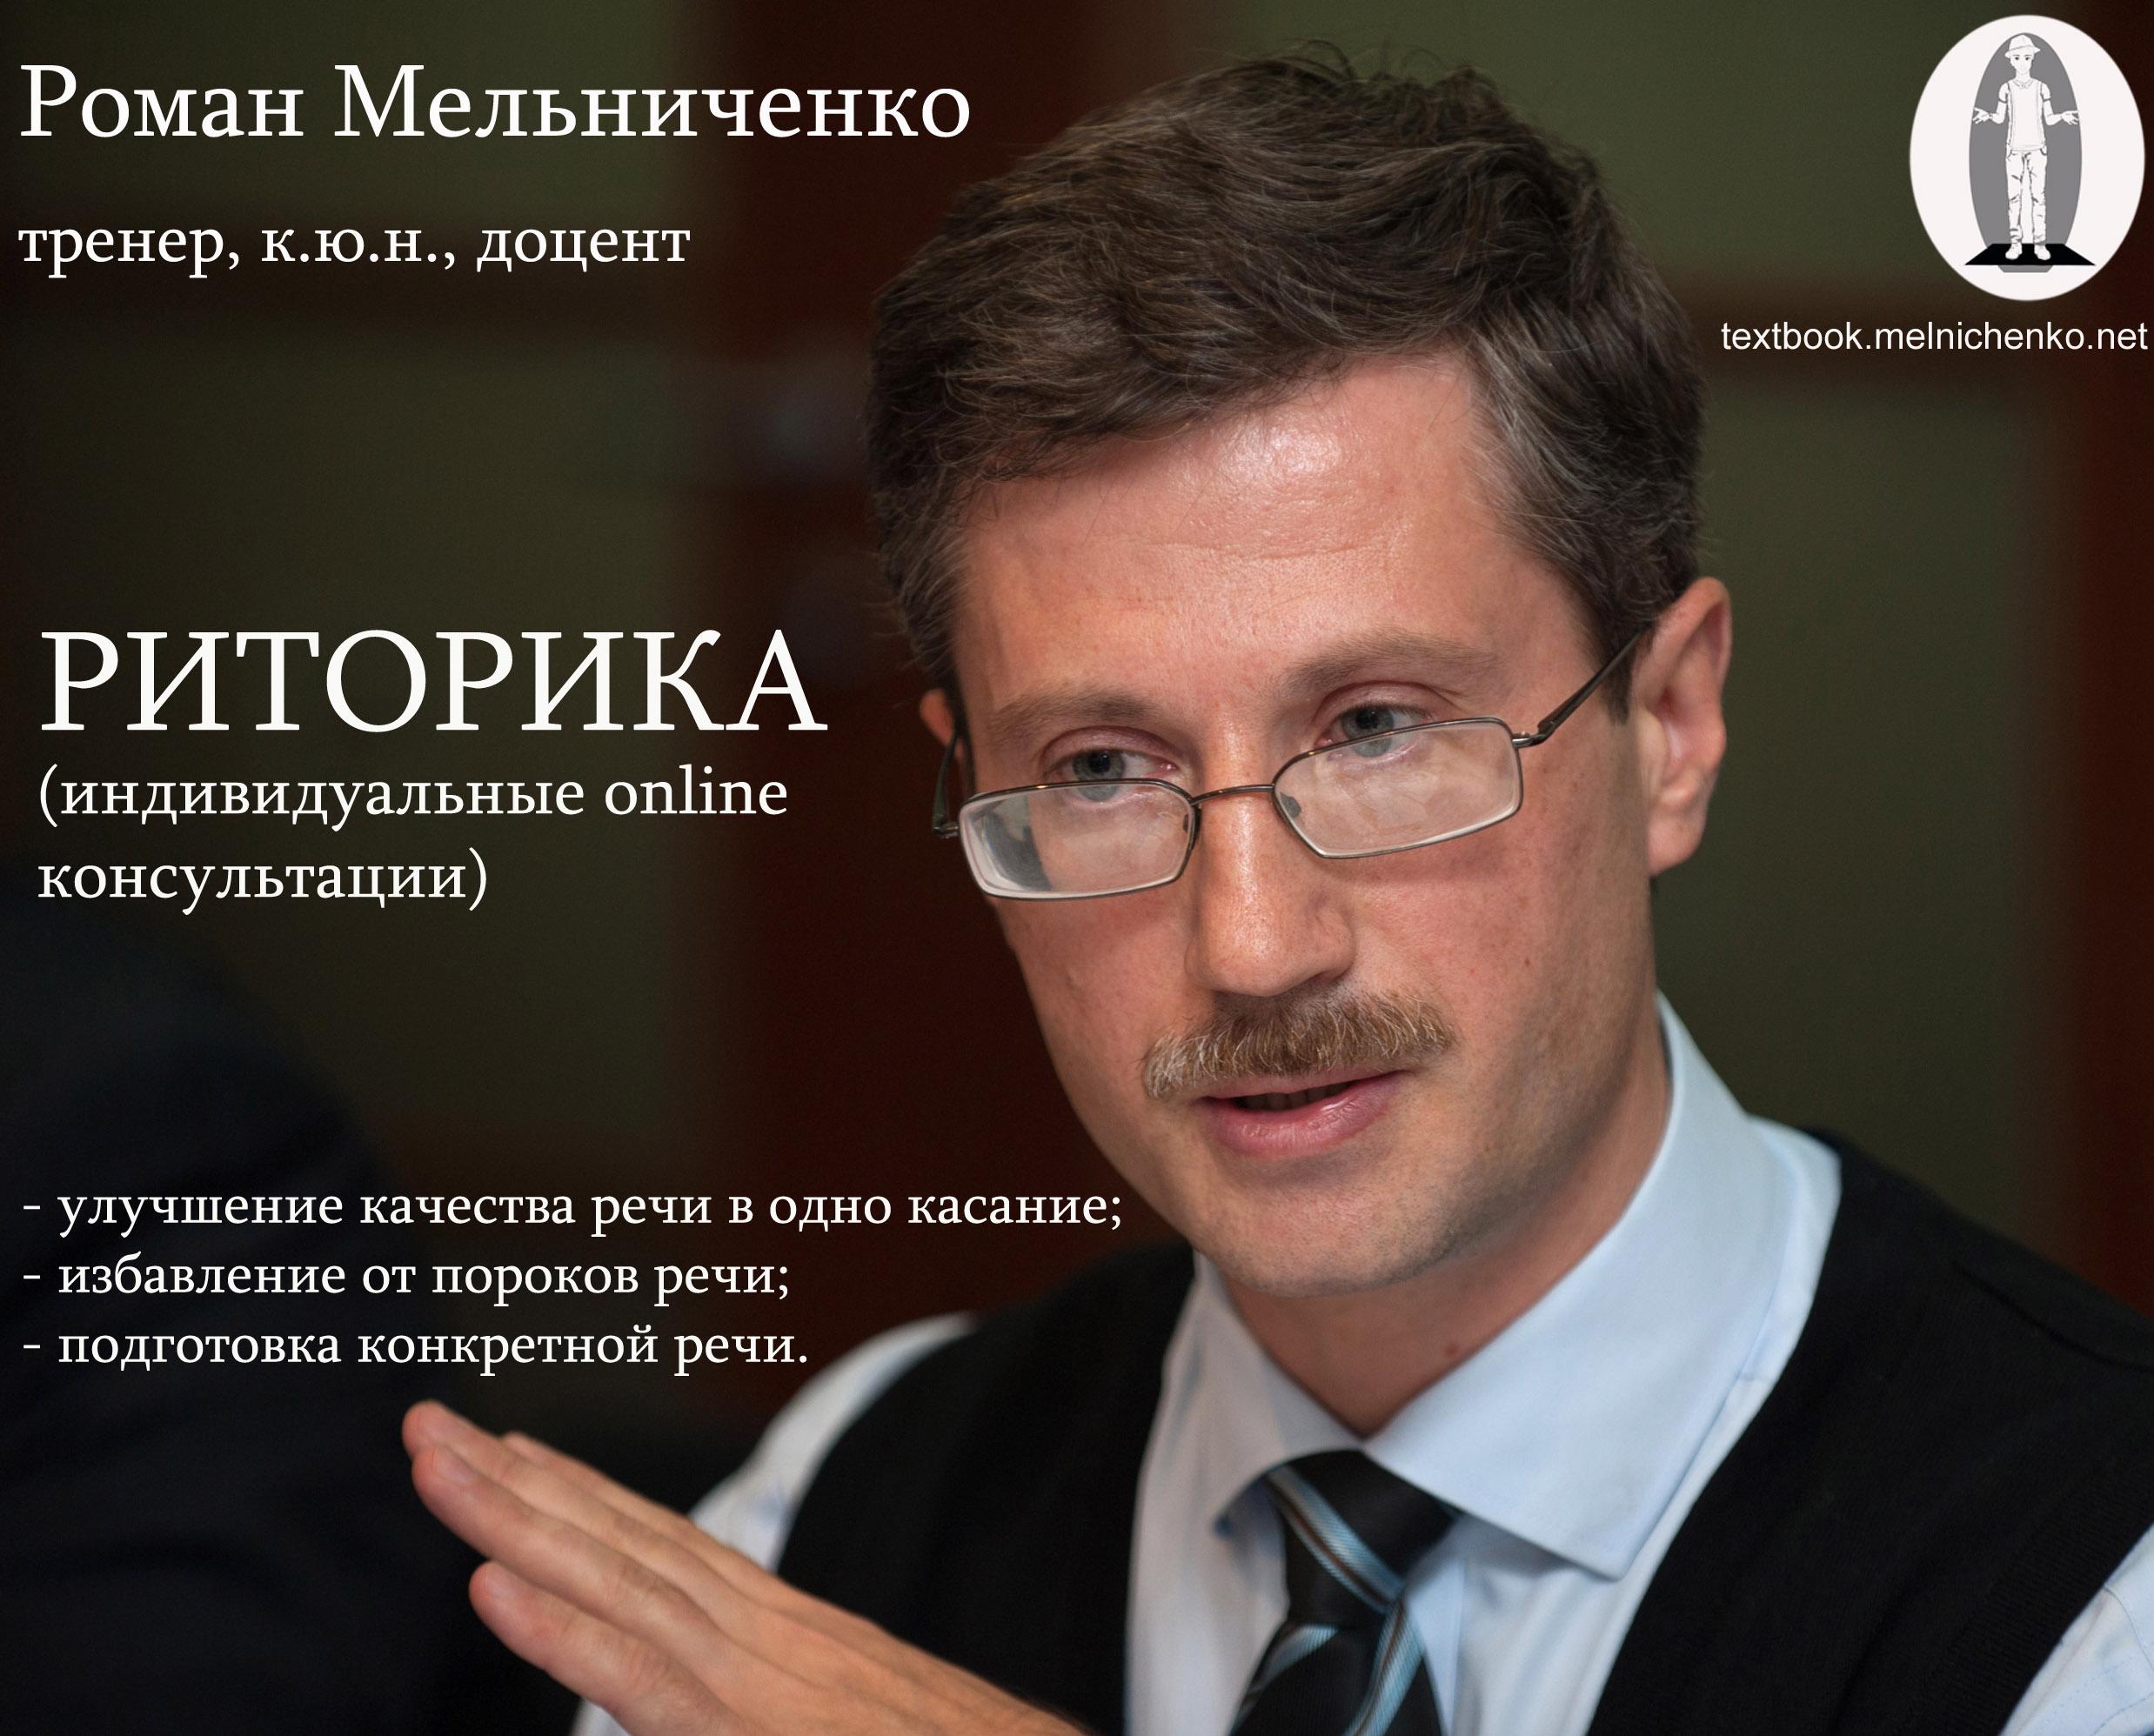 тренер Мельниченко Р.Г.